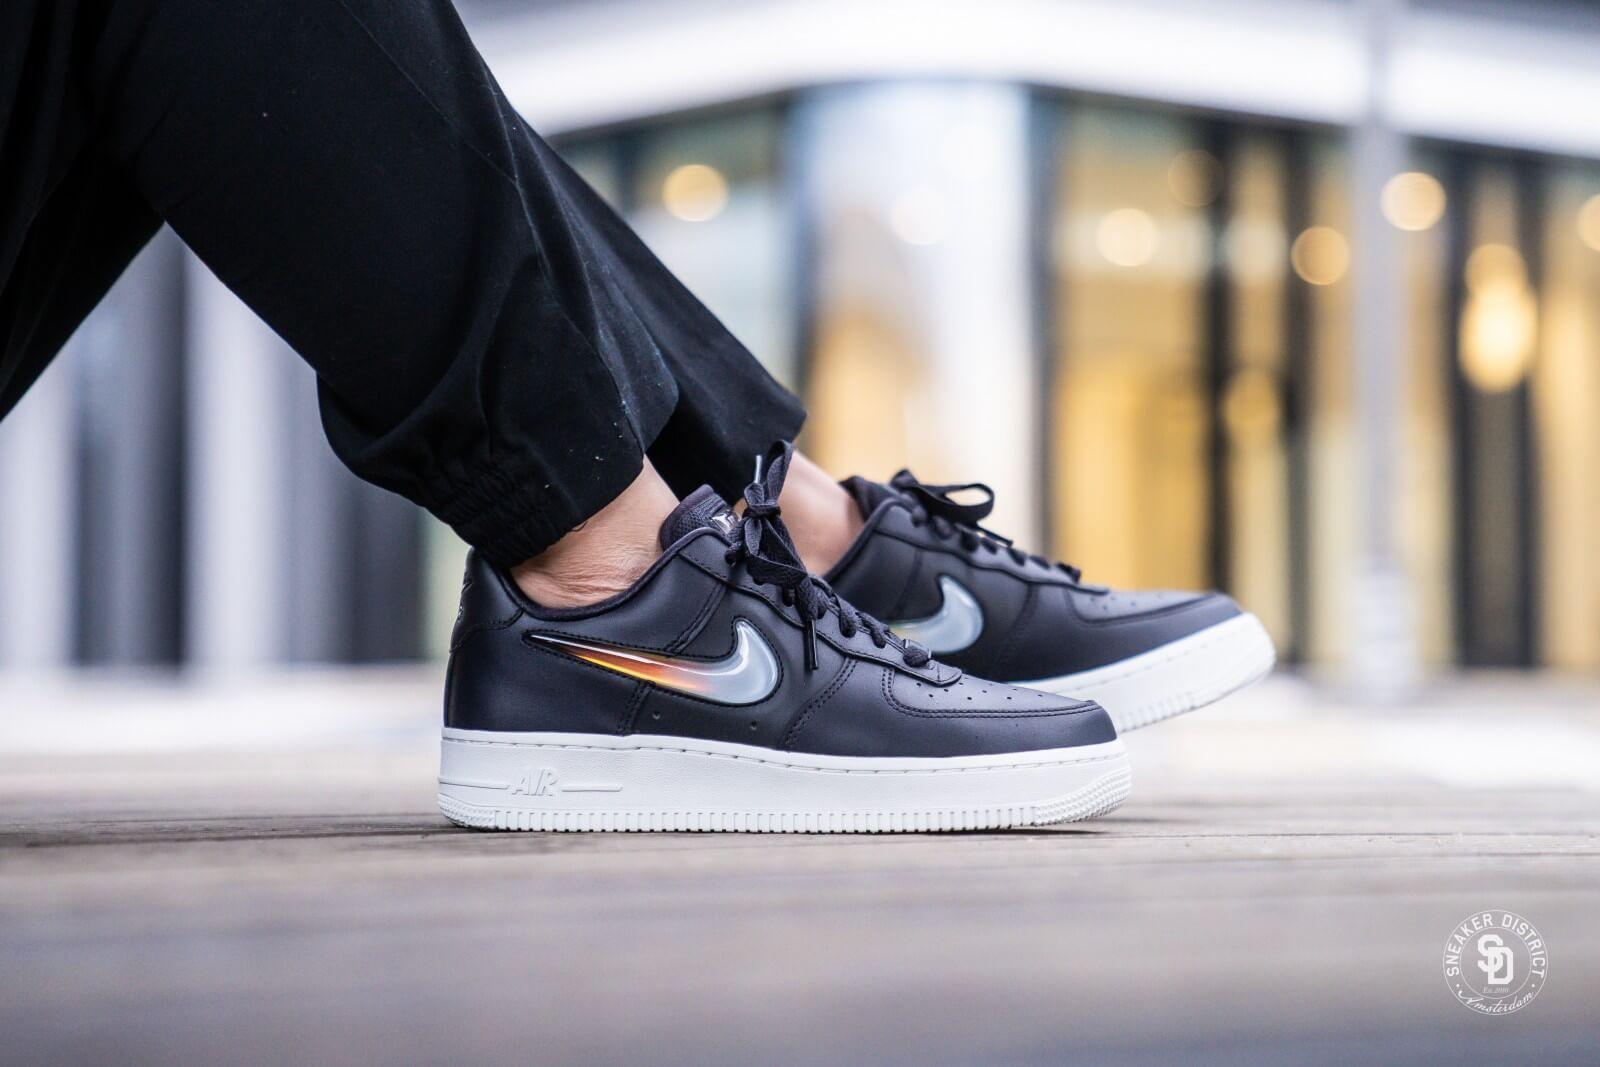 Goods Lab: NIKE AIR FORCE 1 OBSIDIAN Nike air force 1